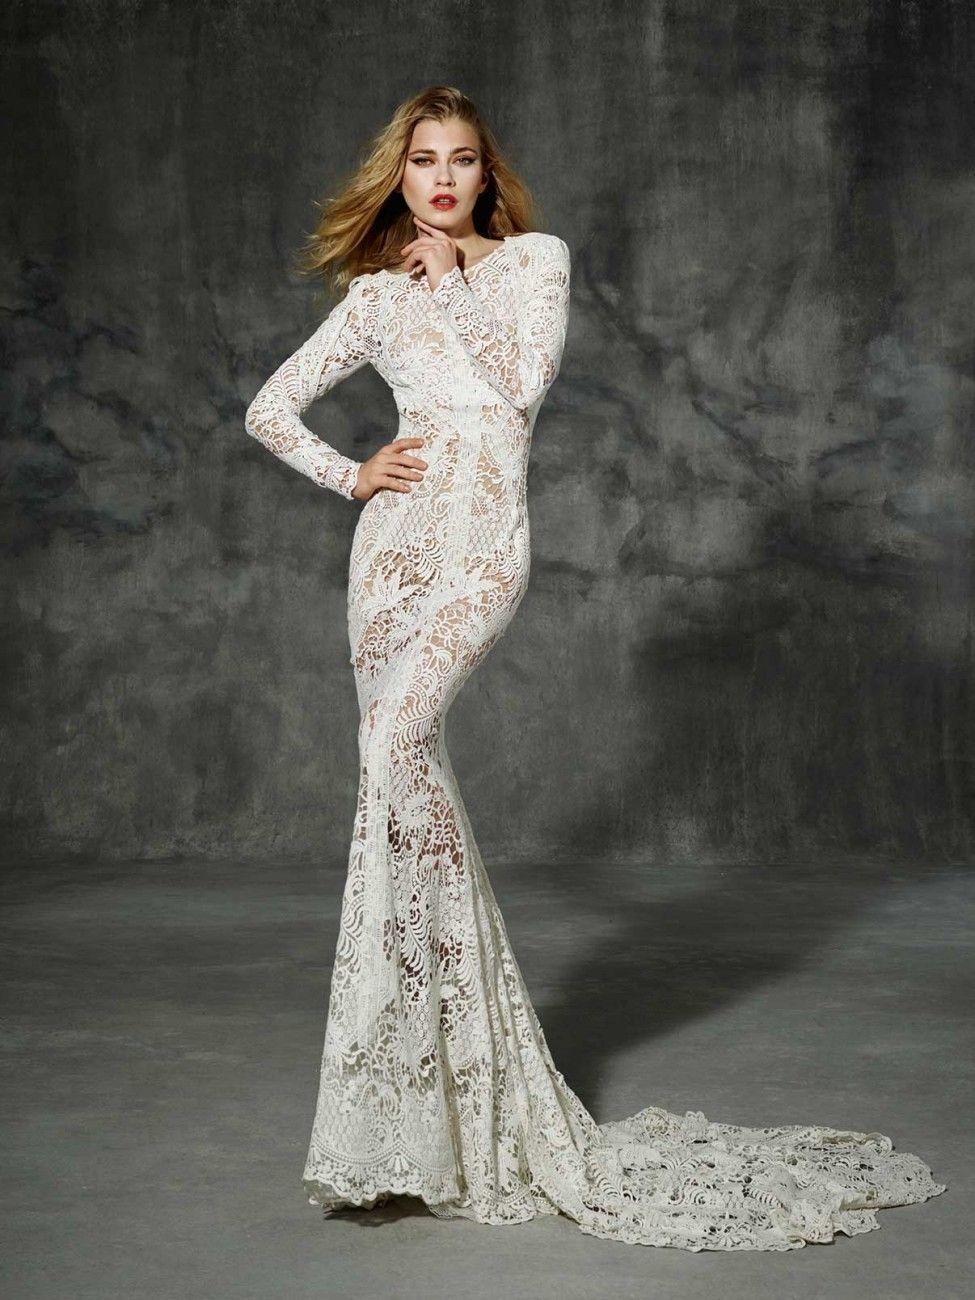 Must see vestidos de noiva pinterest orchid wedding dress and